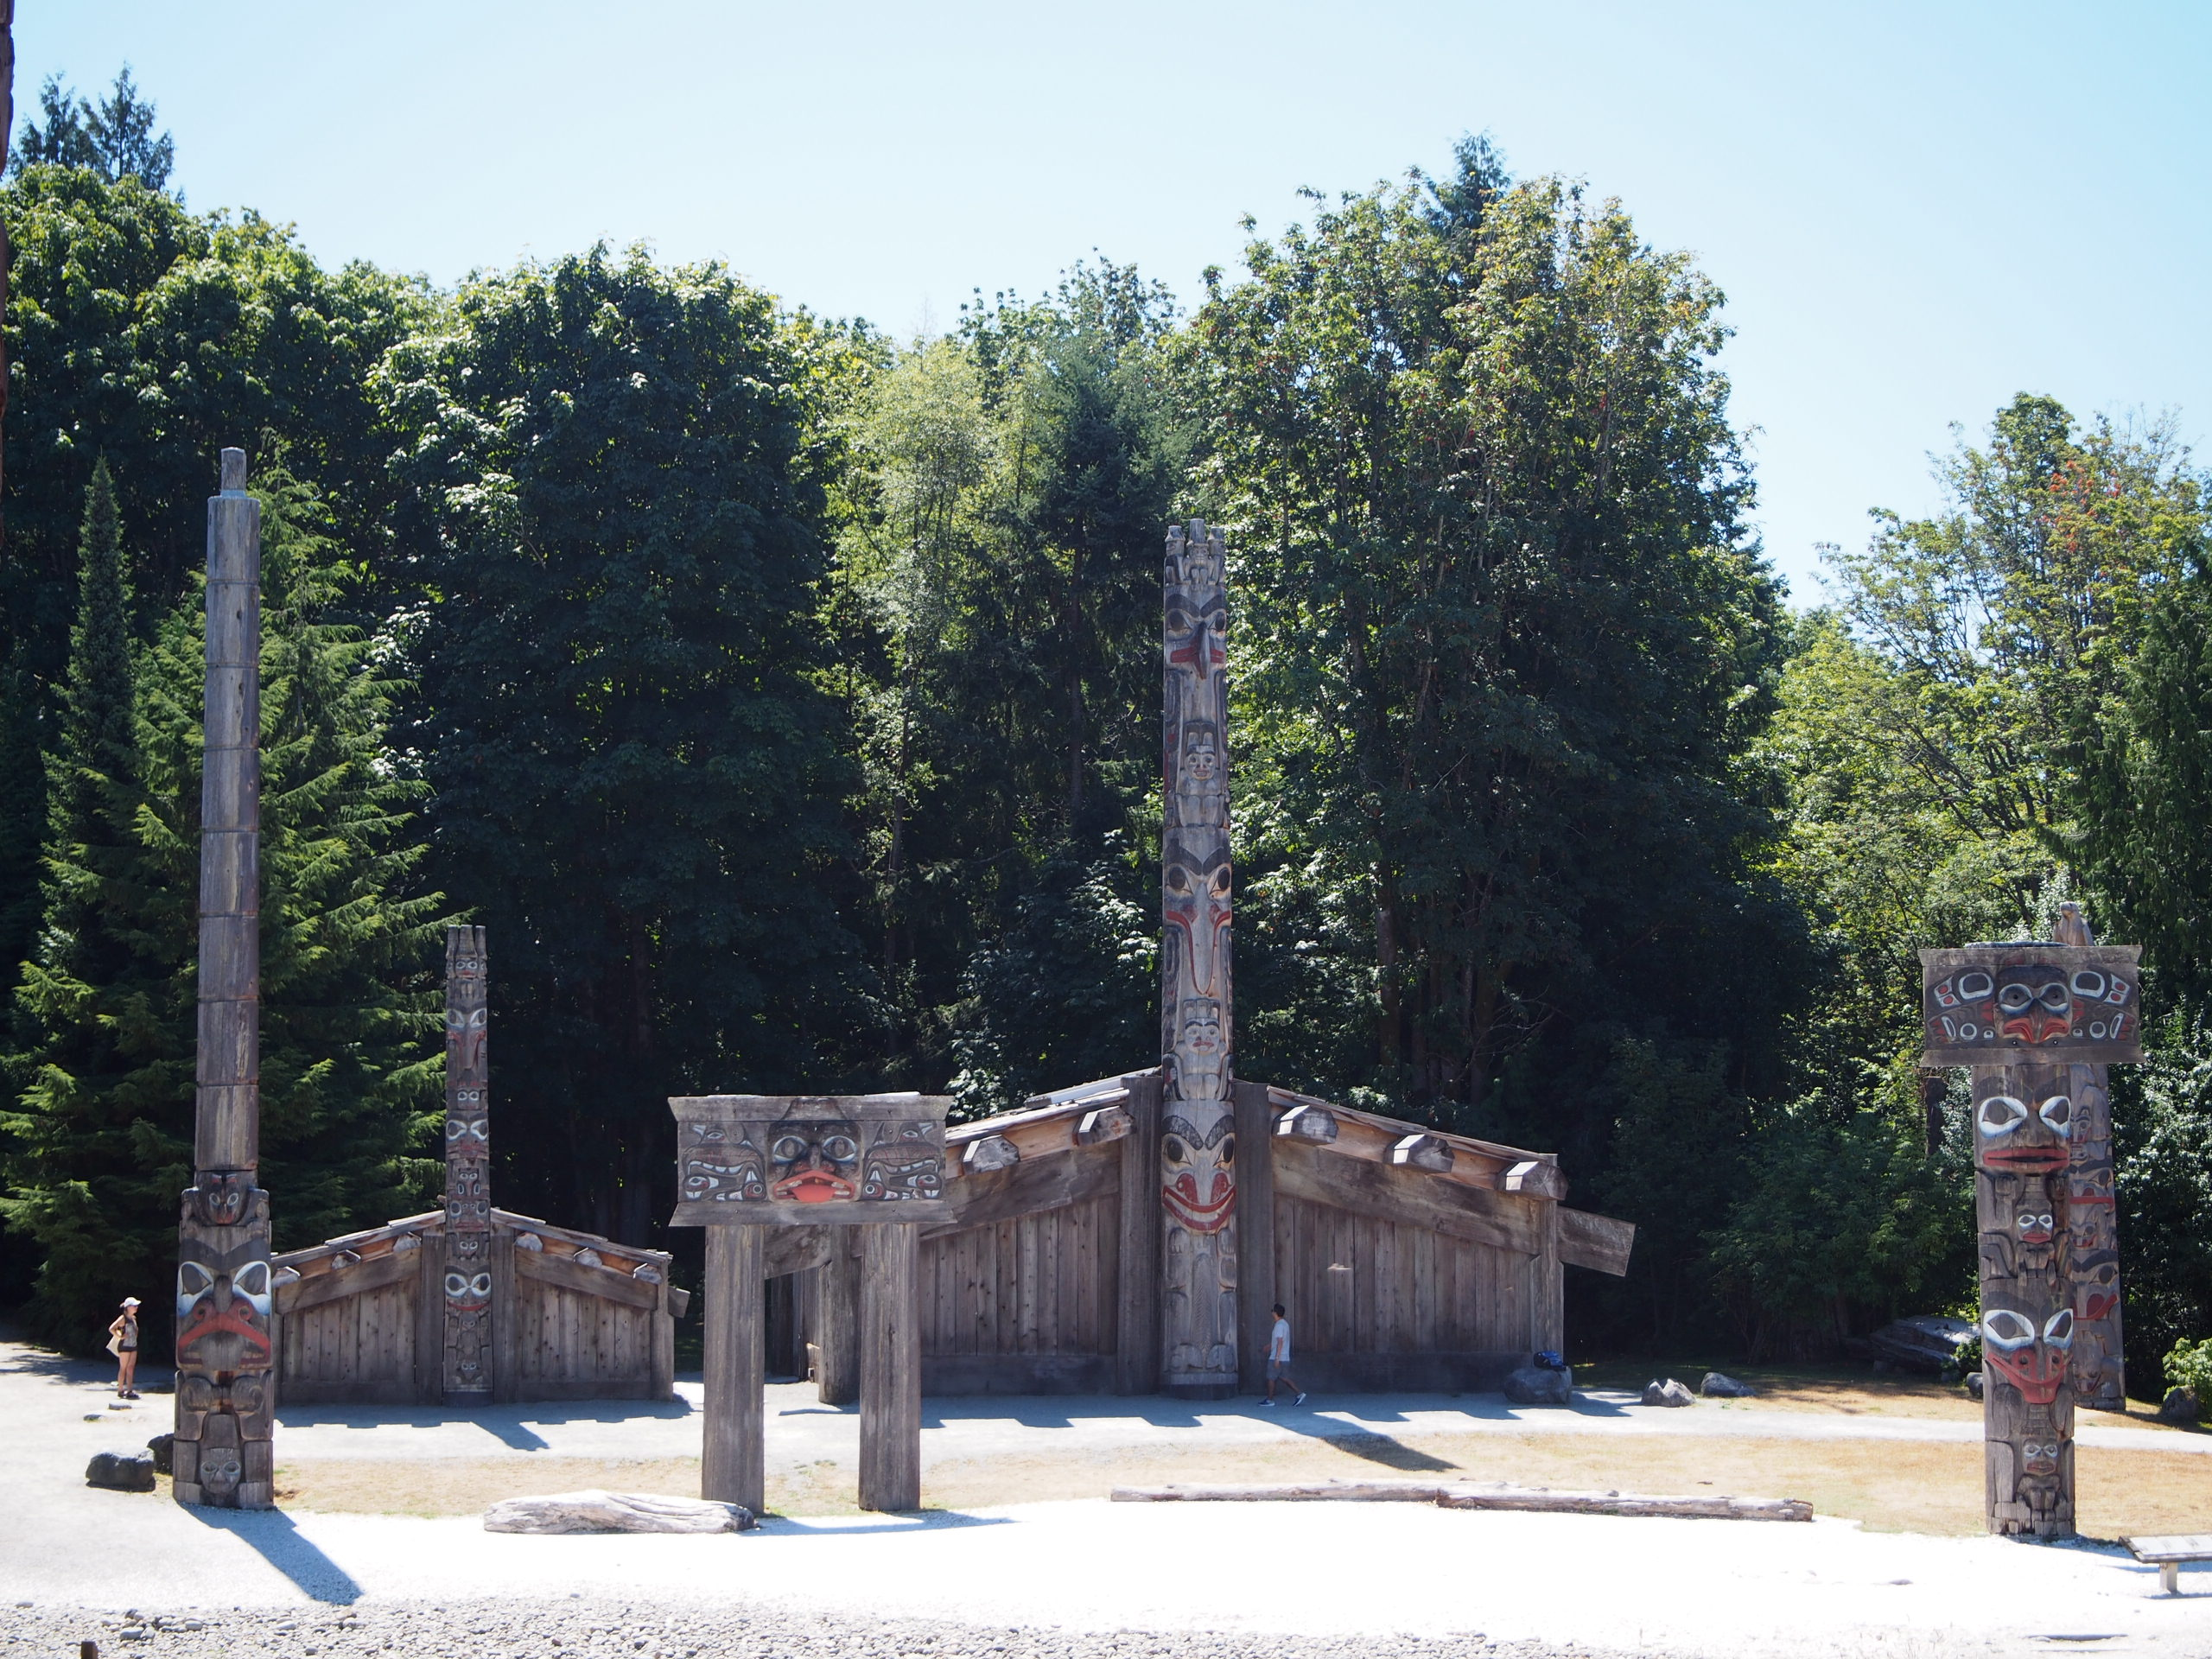 UBC人類学博物館に再現されたハイダ族の家とトーテムポール。